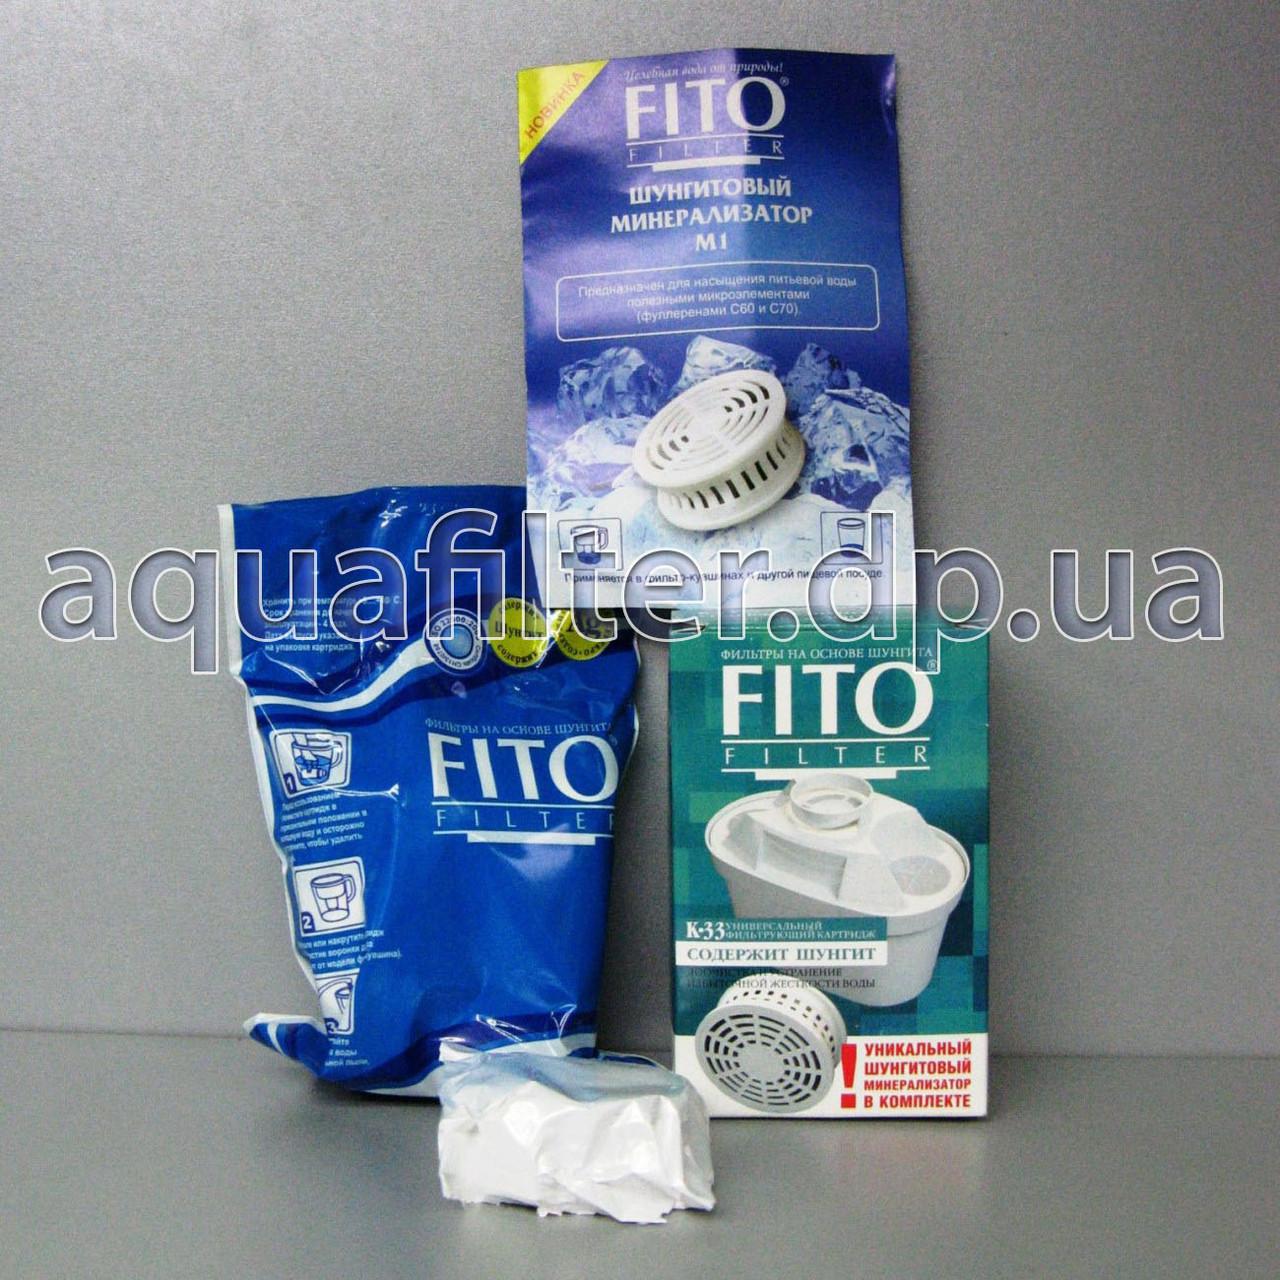 Сменный картридж Fito Filter K-33 Макстра, фото 1